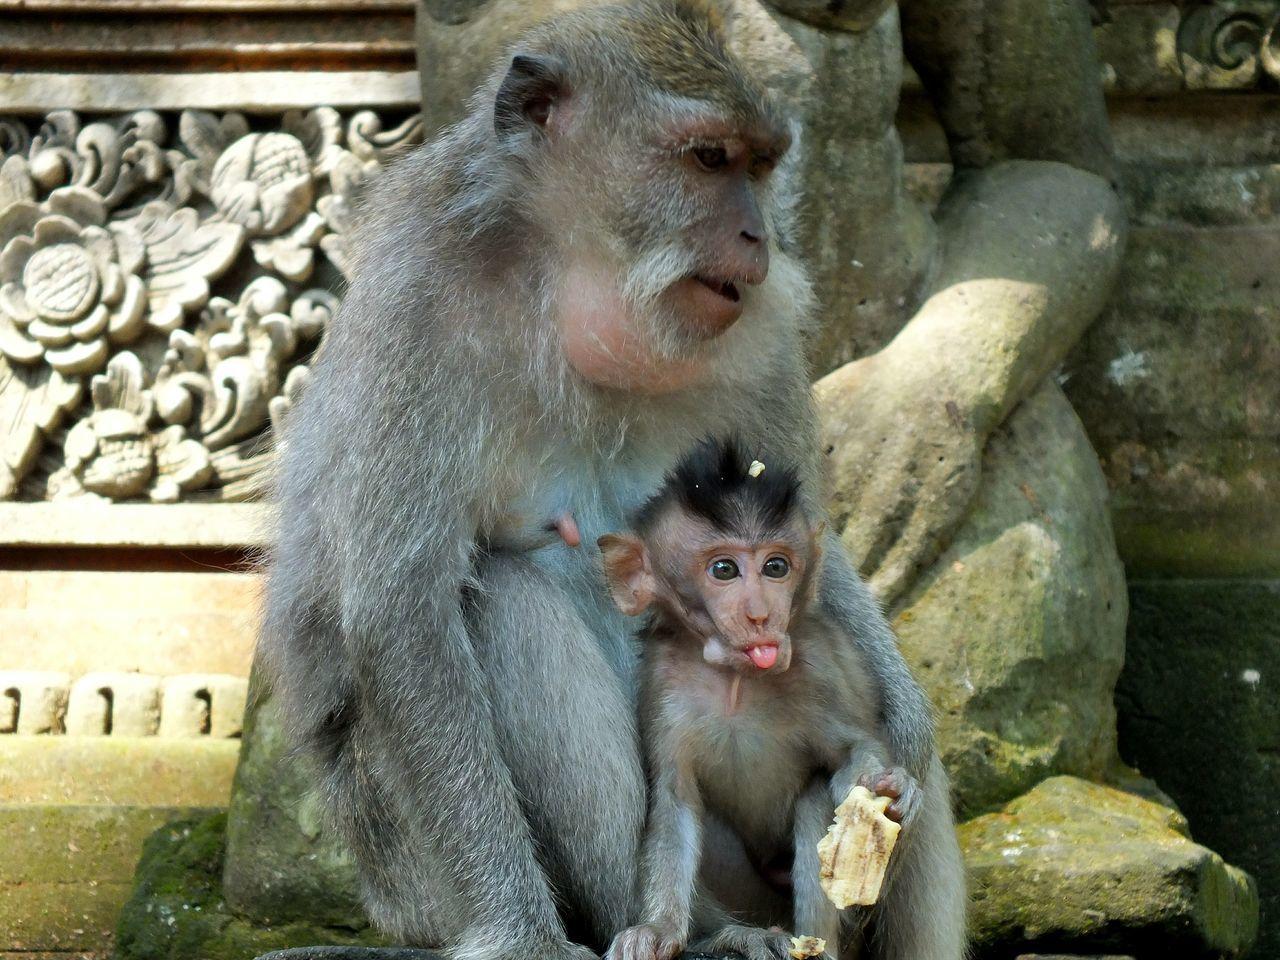 Monkey Mammal Animal Themes Primate Animal Family Outdoors Animals In The Wild Nature Animals Baby Wildlife Wildlife Photography Beauty In Nature Ubud Bali INDONESIA